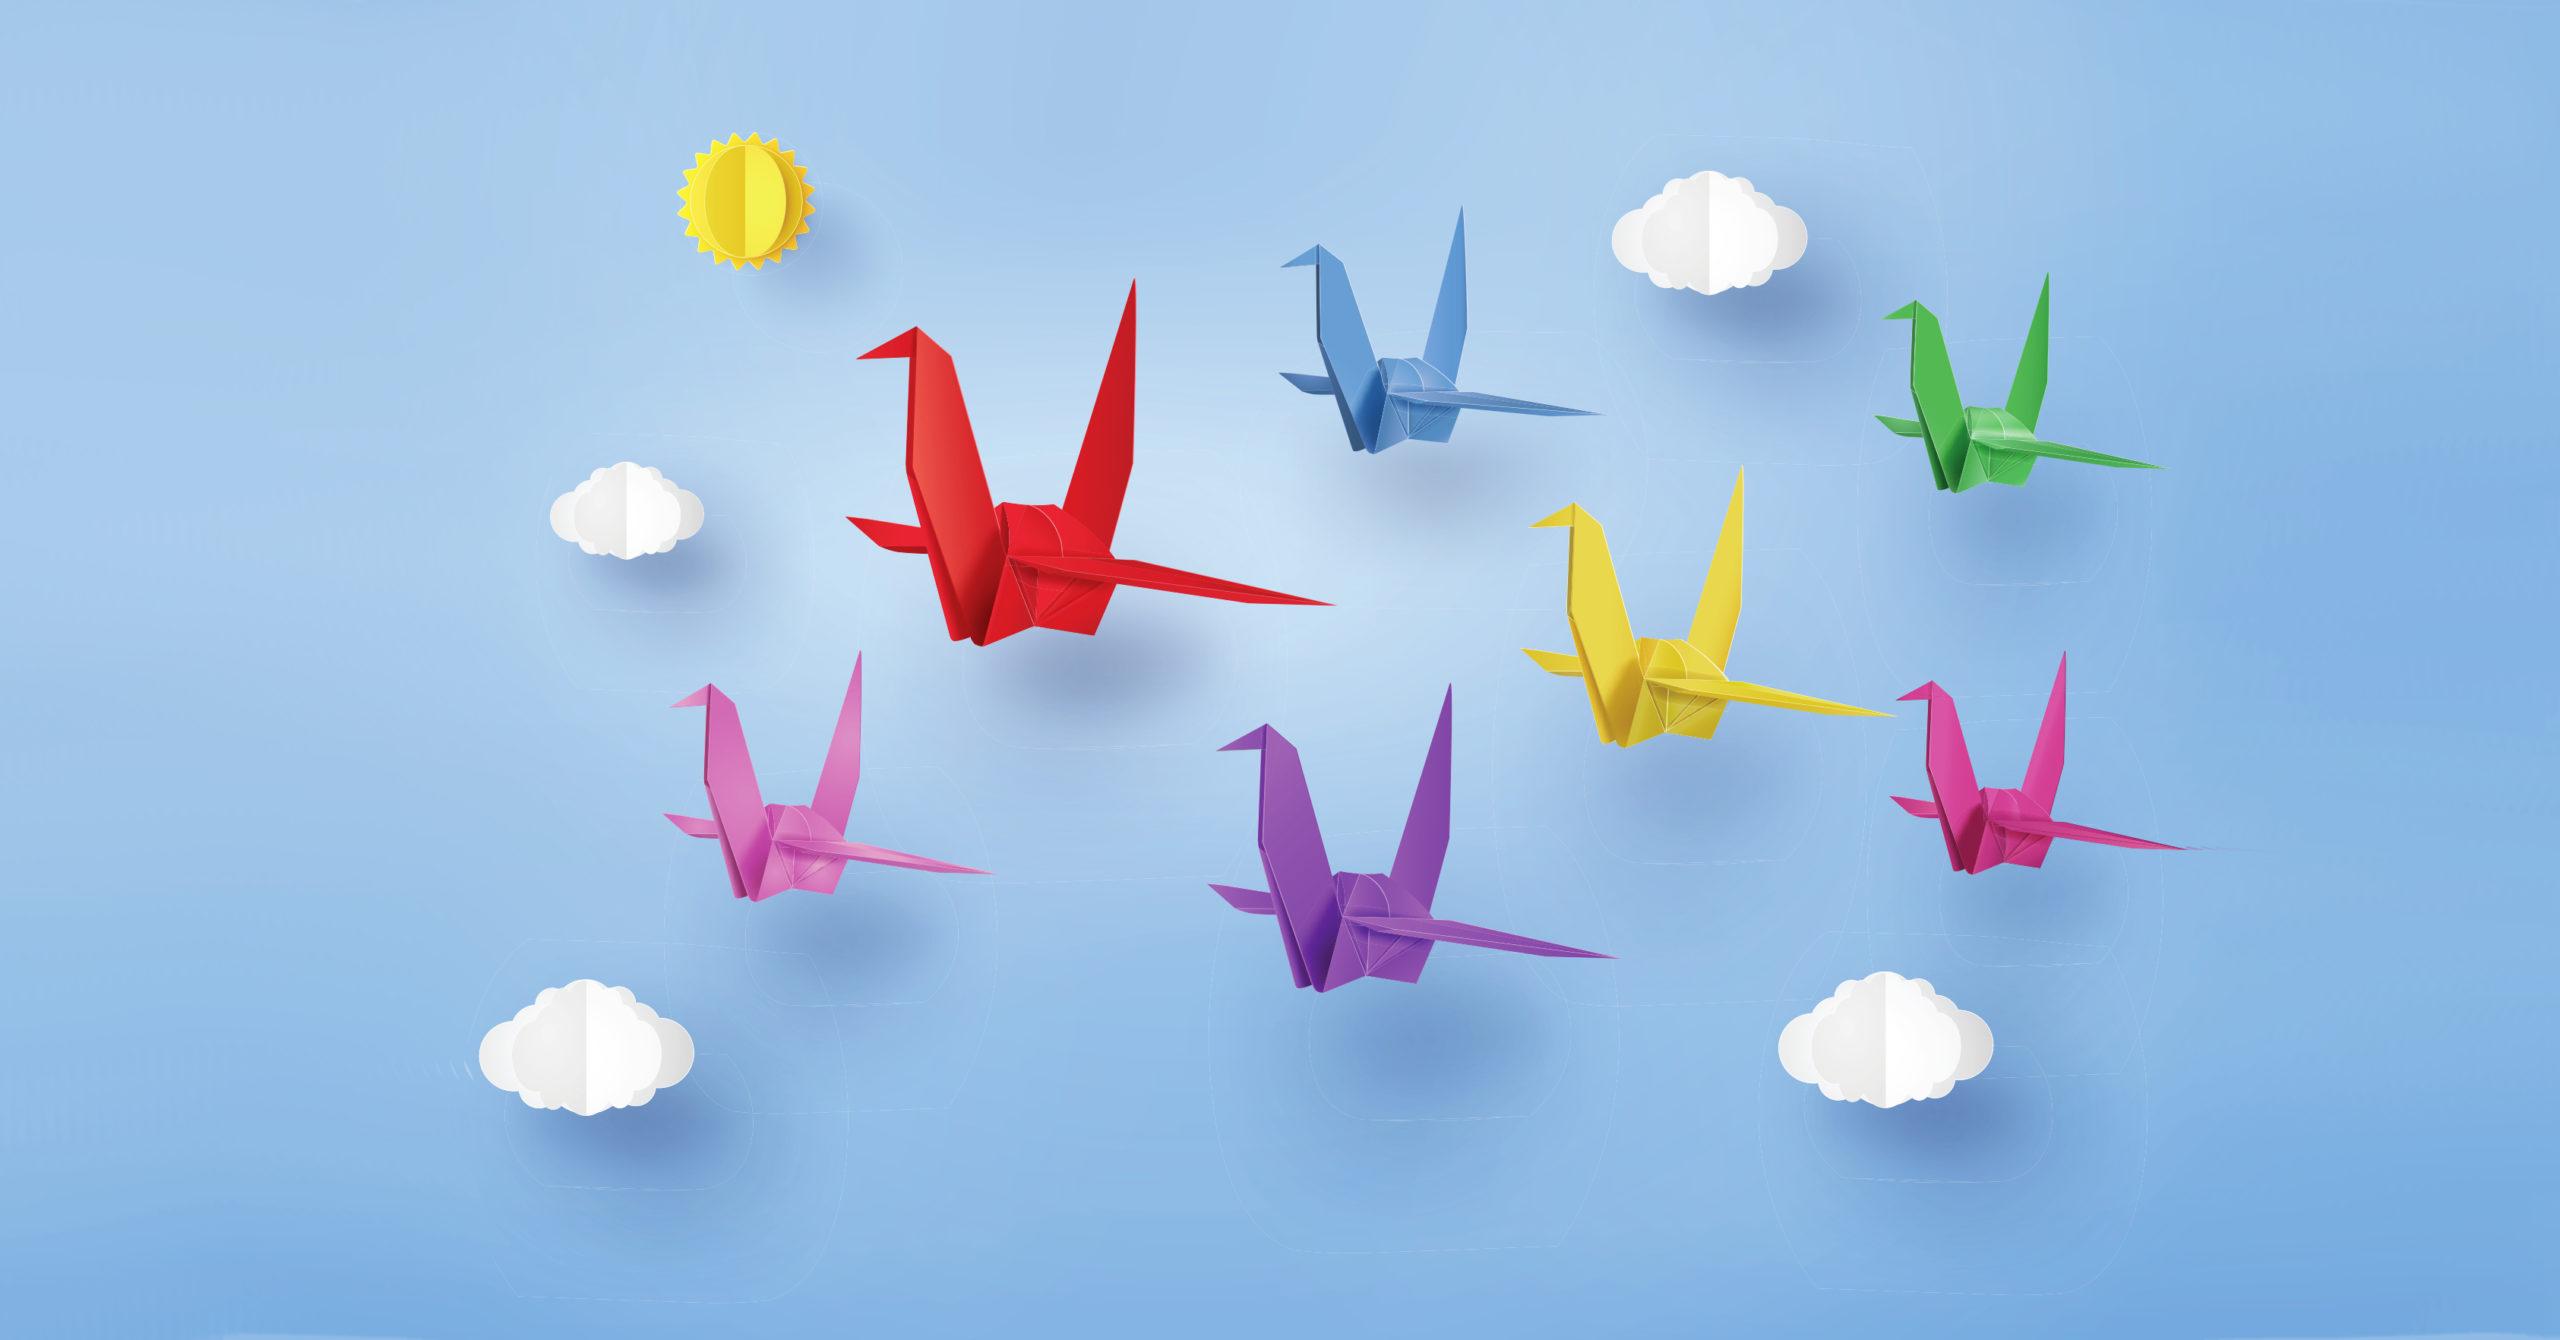 Origami paper crane transparent png | free image by rawpixel.com ... | 1340x2560